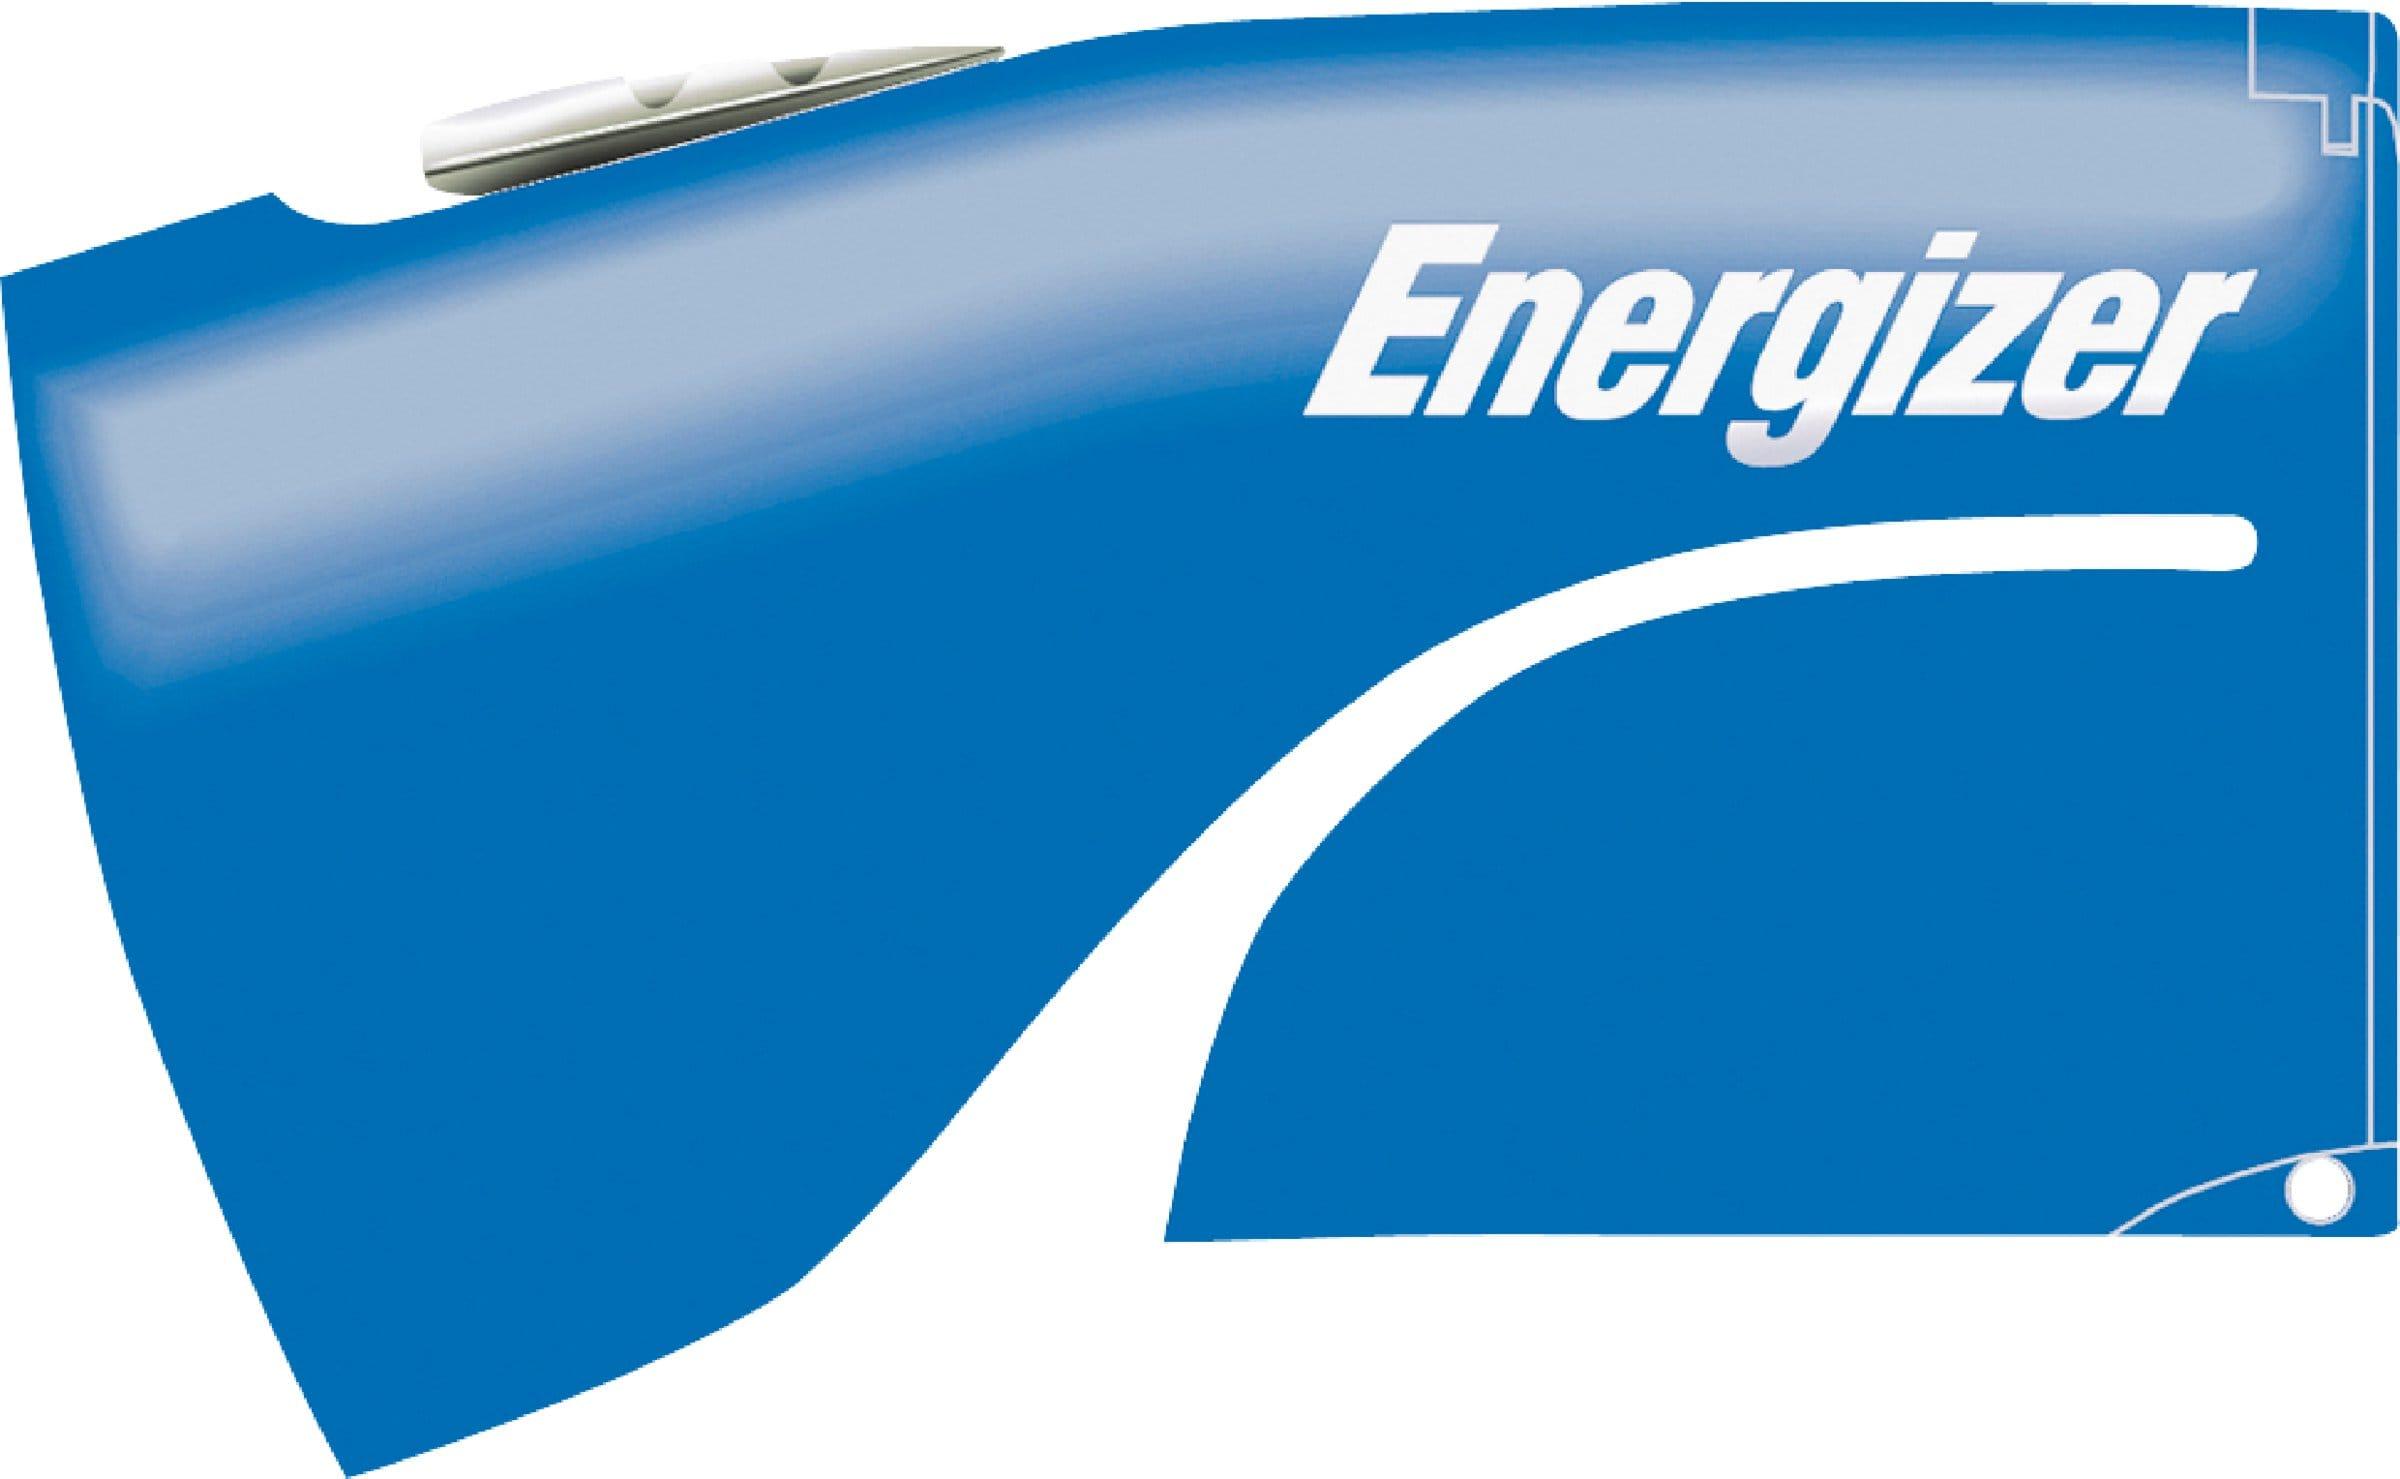 Energizer Pocket LED